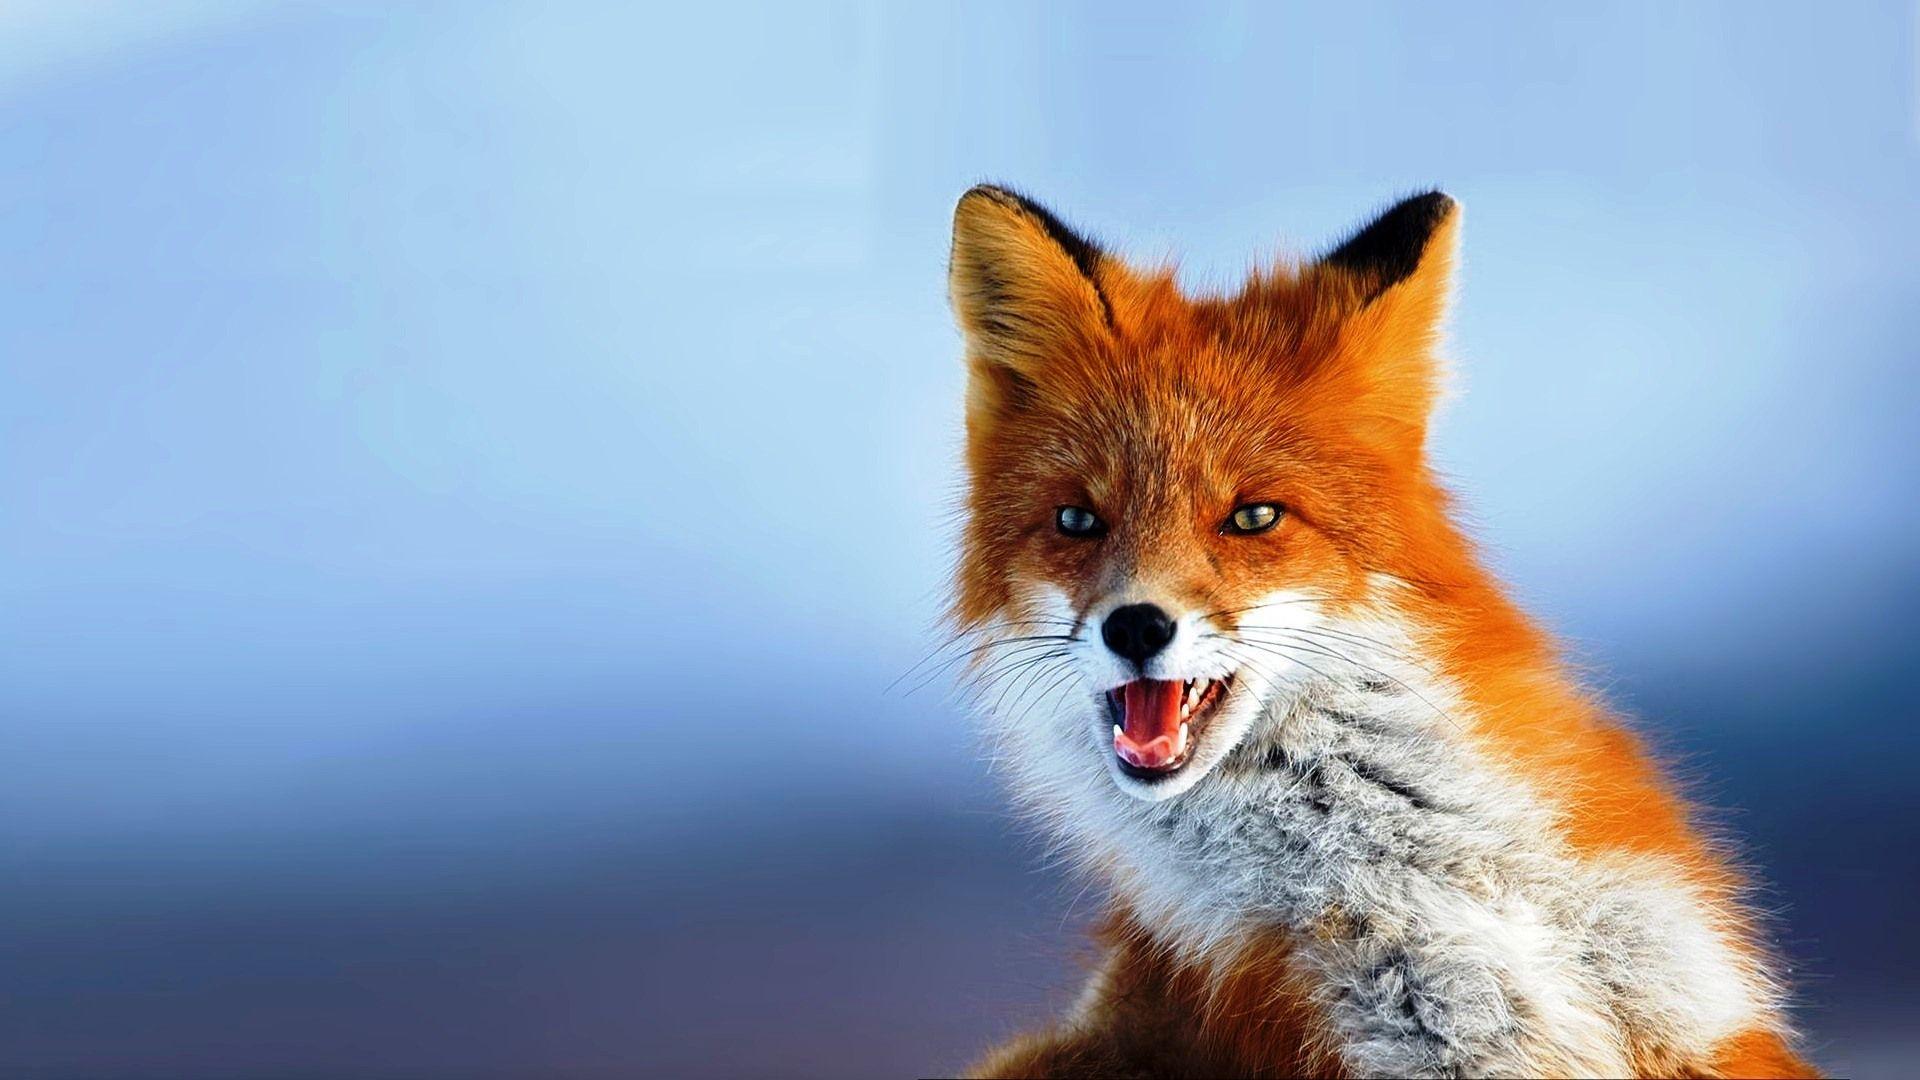 fox hd wallpapers | hd wallpapers fit | animals | pet fox, red fox